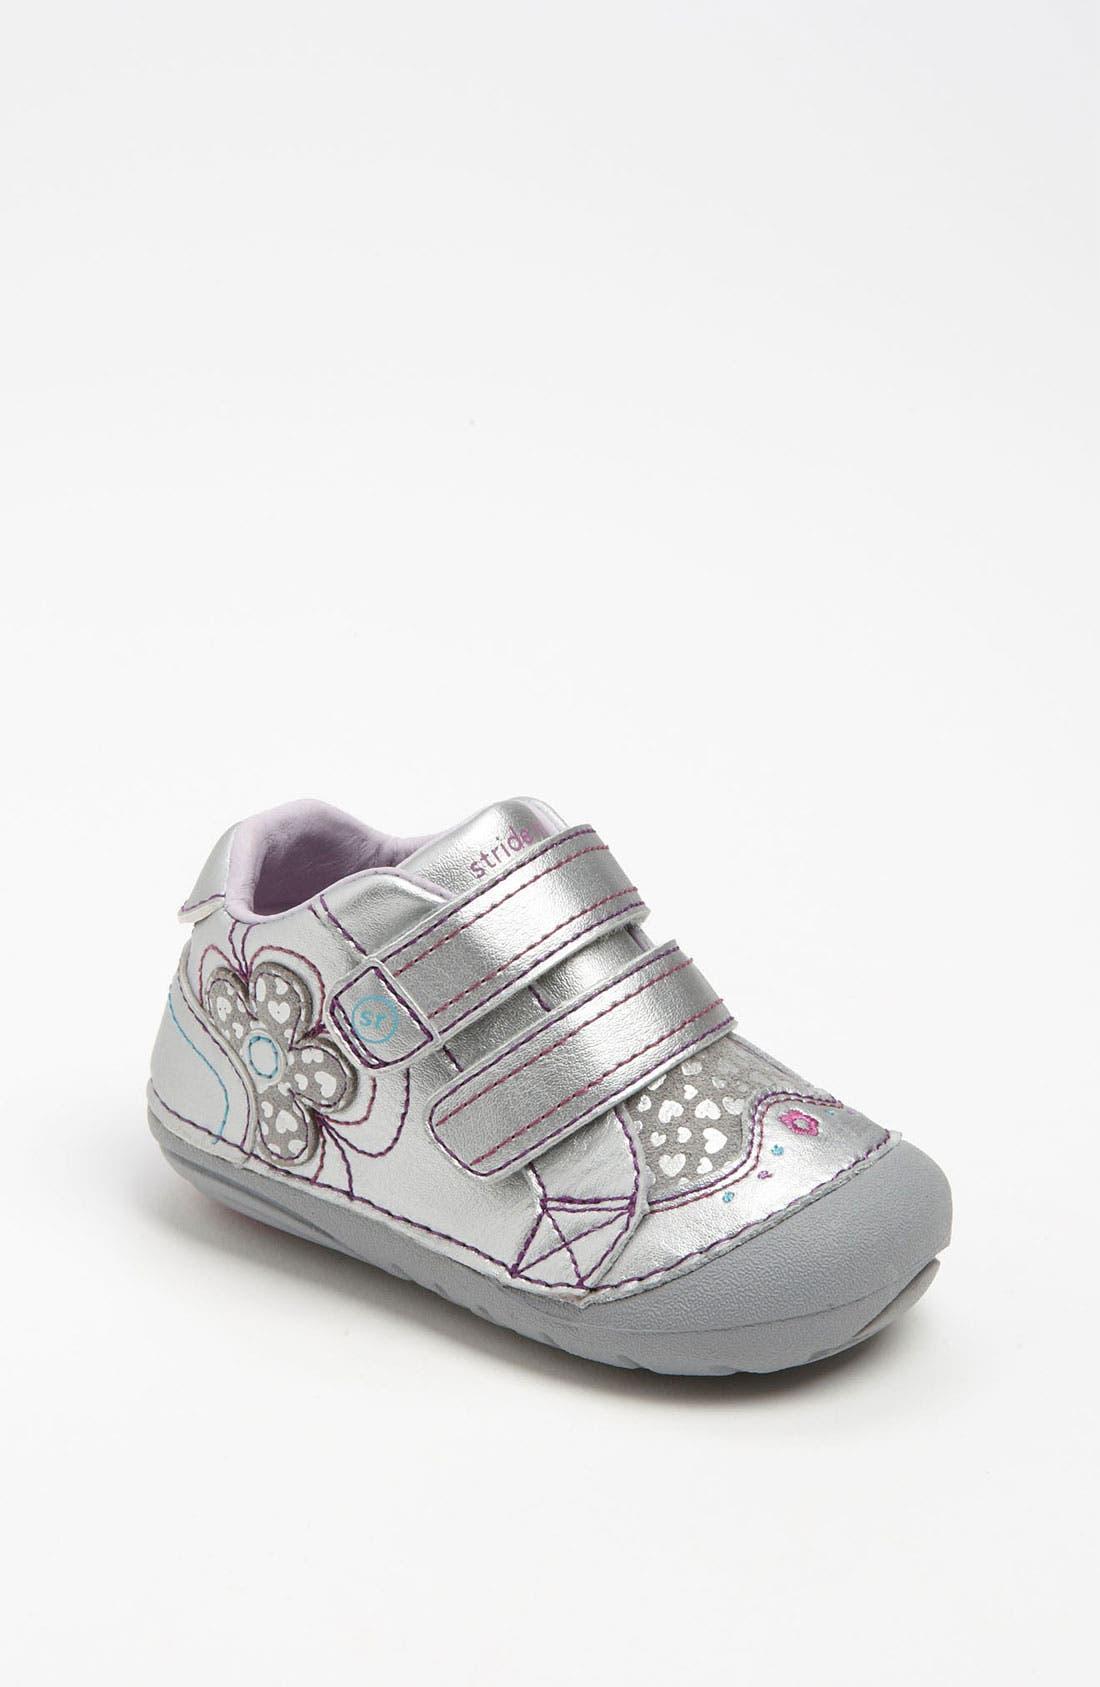 Main Image - Stride Rite 'Gloria' Sneaker (Baby & Walker)